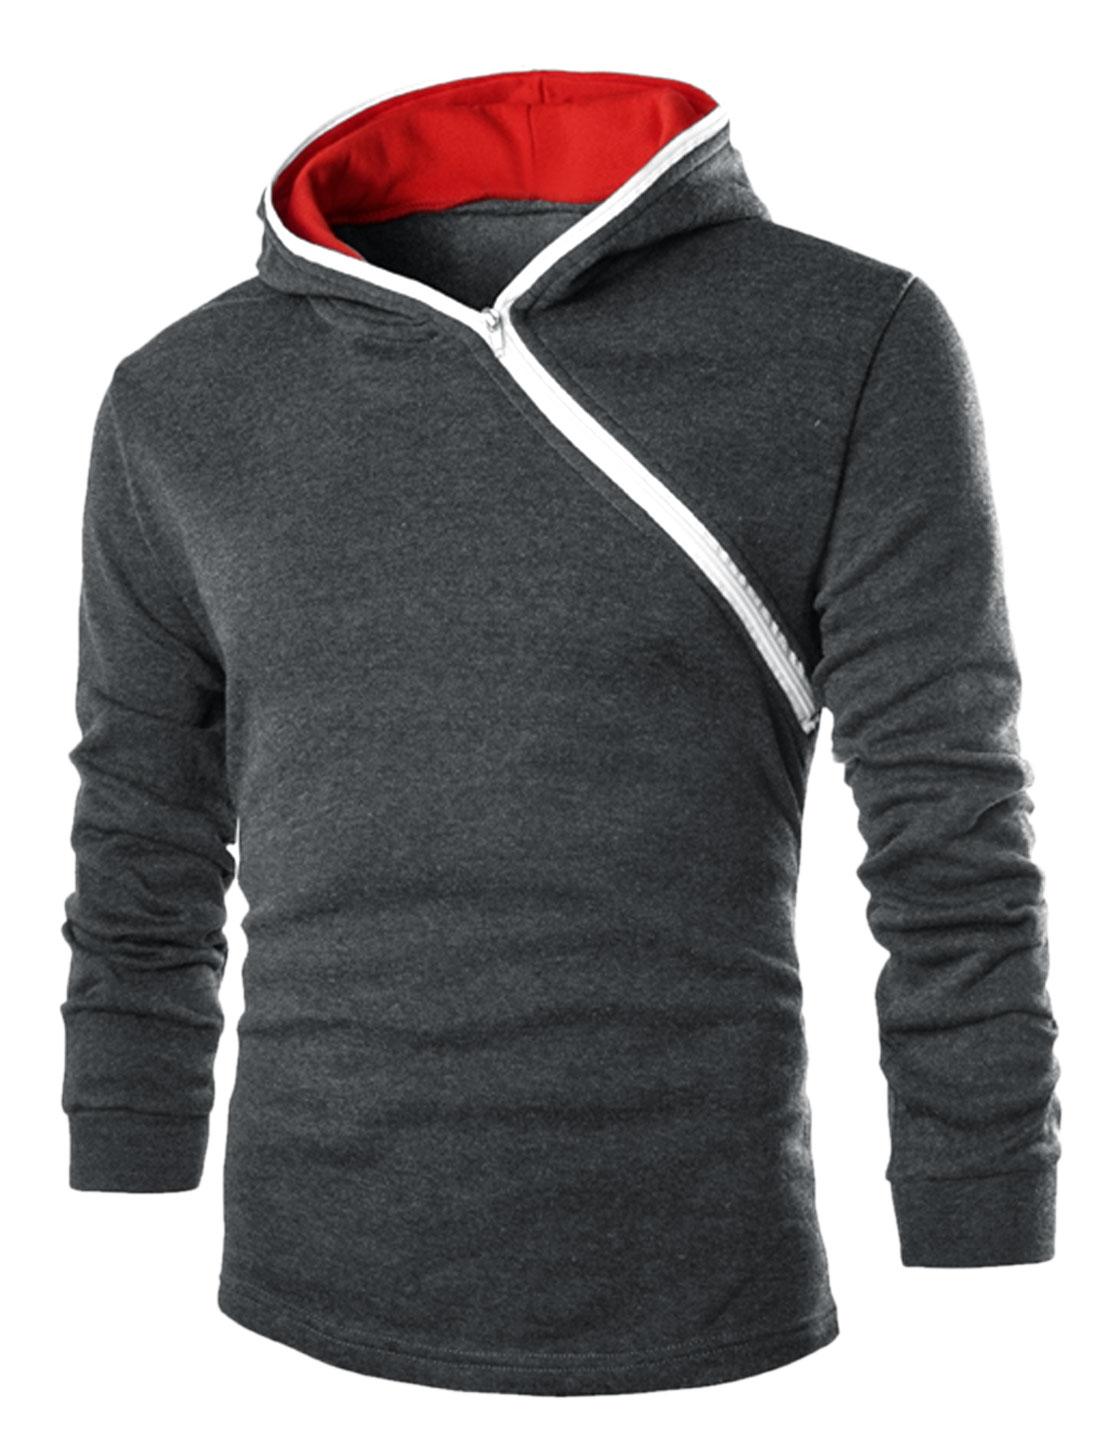 Men Half Inclined Zipper Contrast Color Detail Casual Hoodie Dark Gray M